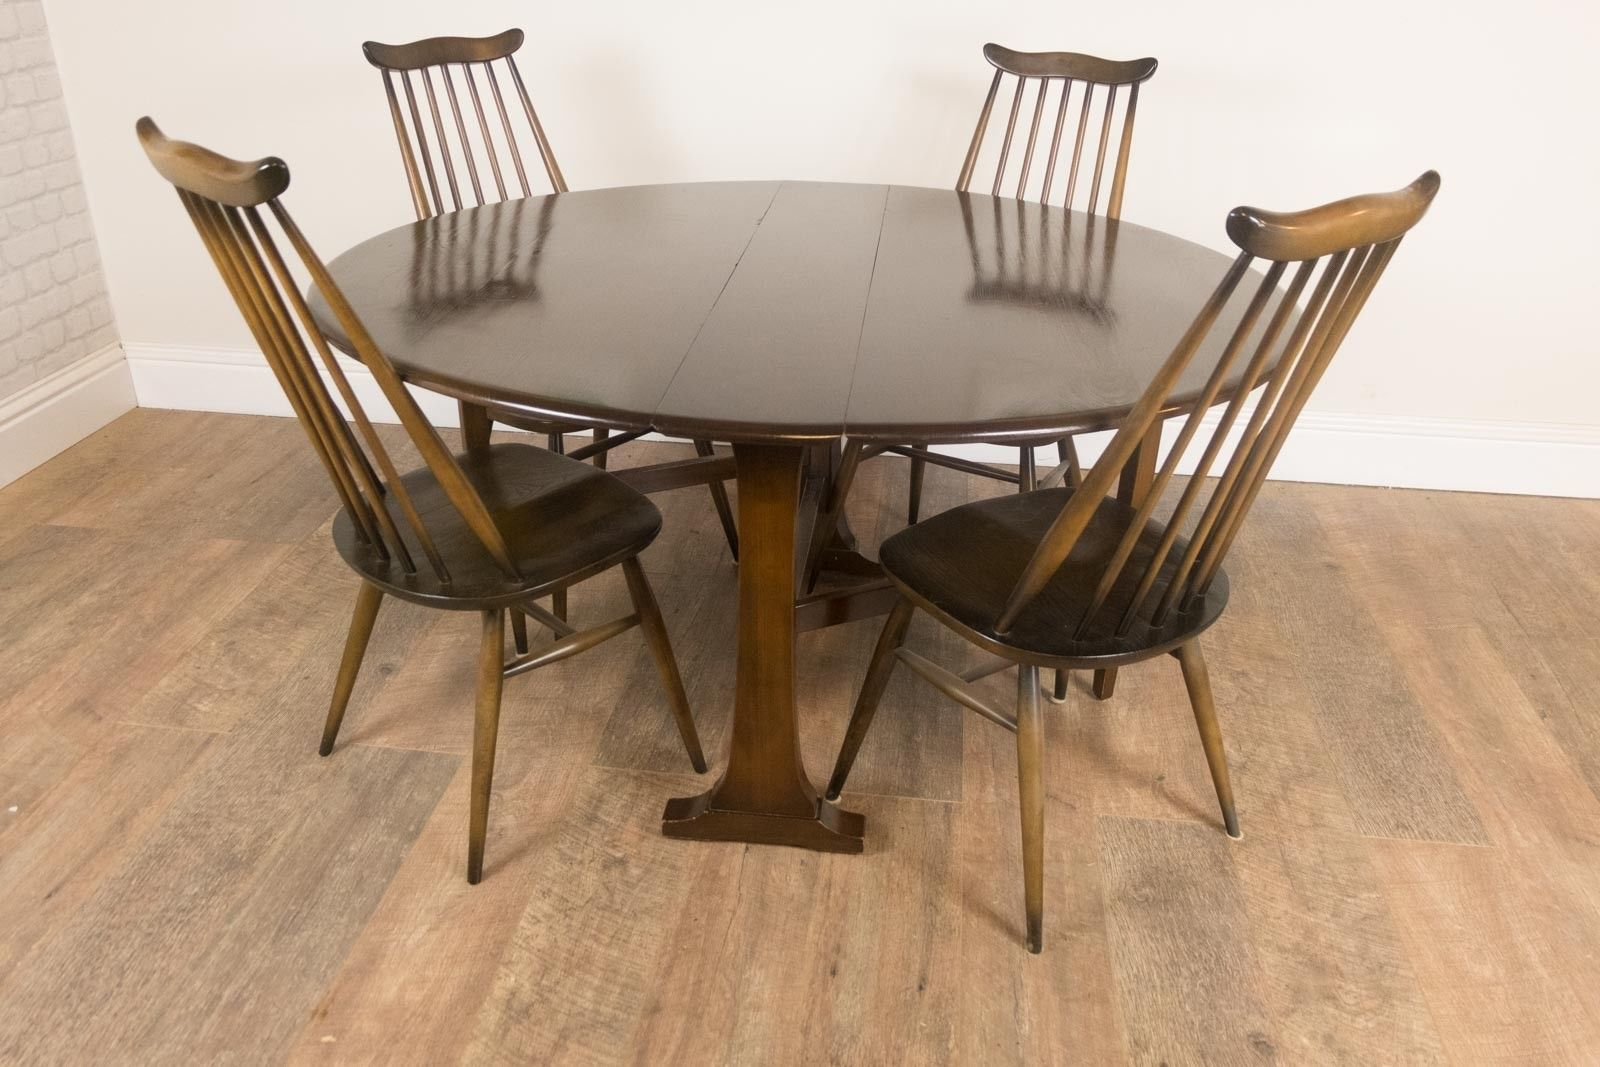 vintage-retro-ercol-dark-elm-drop-leaf-table-and-4-golden-dawn-goldsmith-chairs